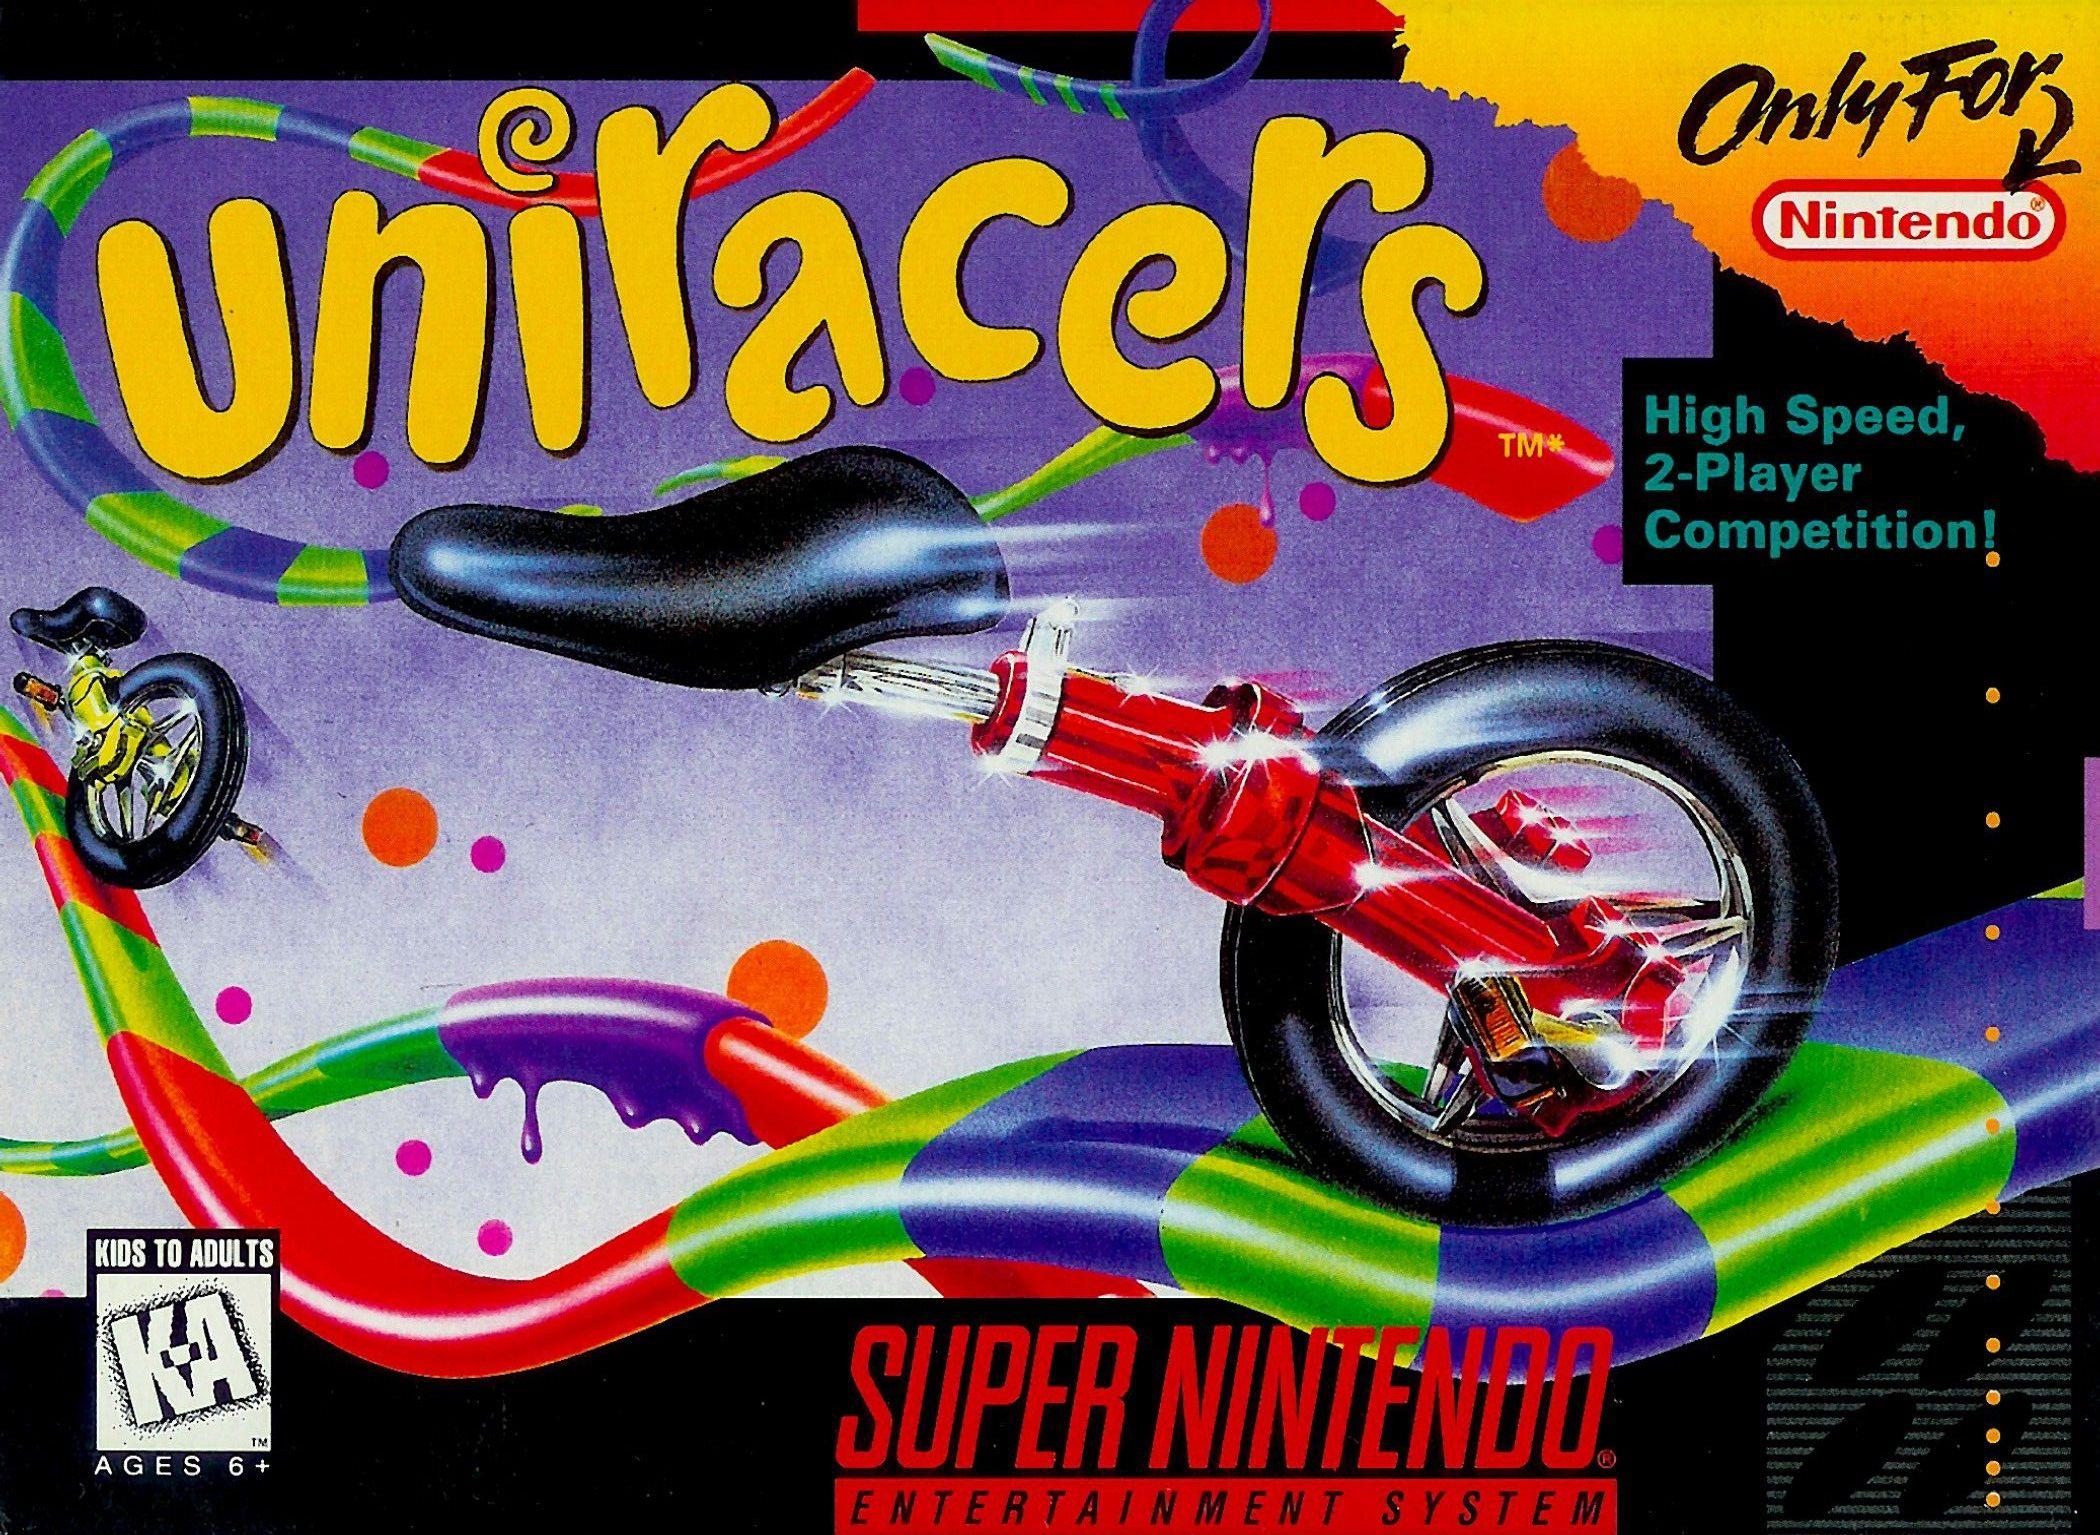 Uniracers Snes Super Nintendo With Images Super Nintendo